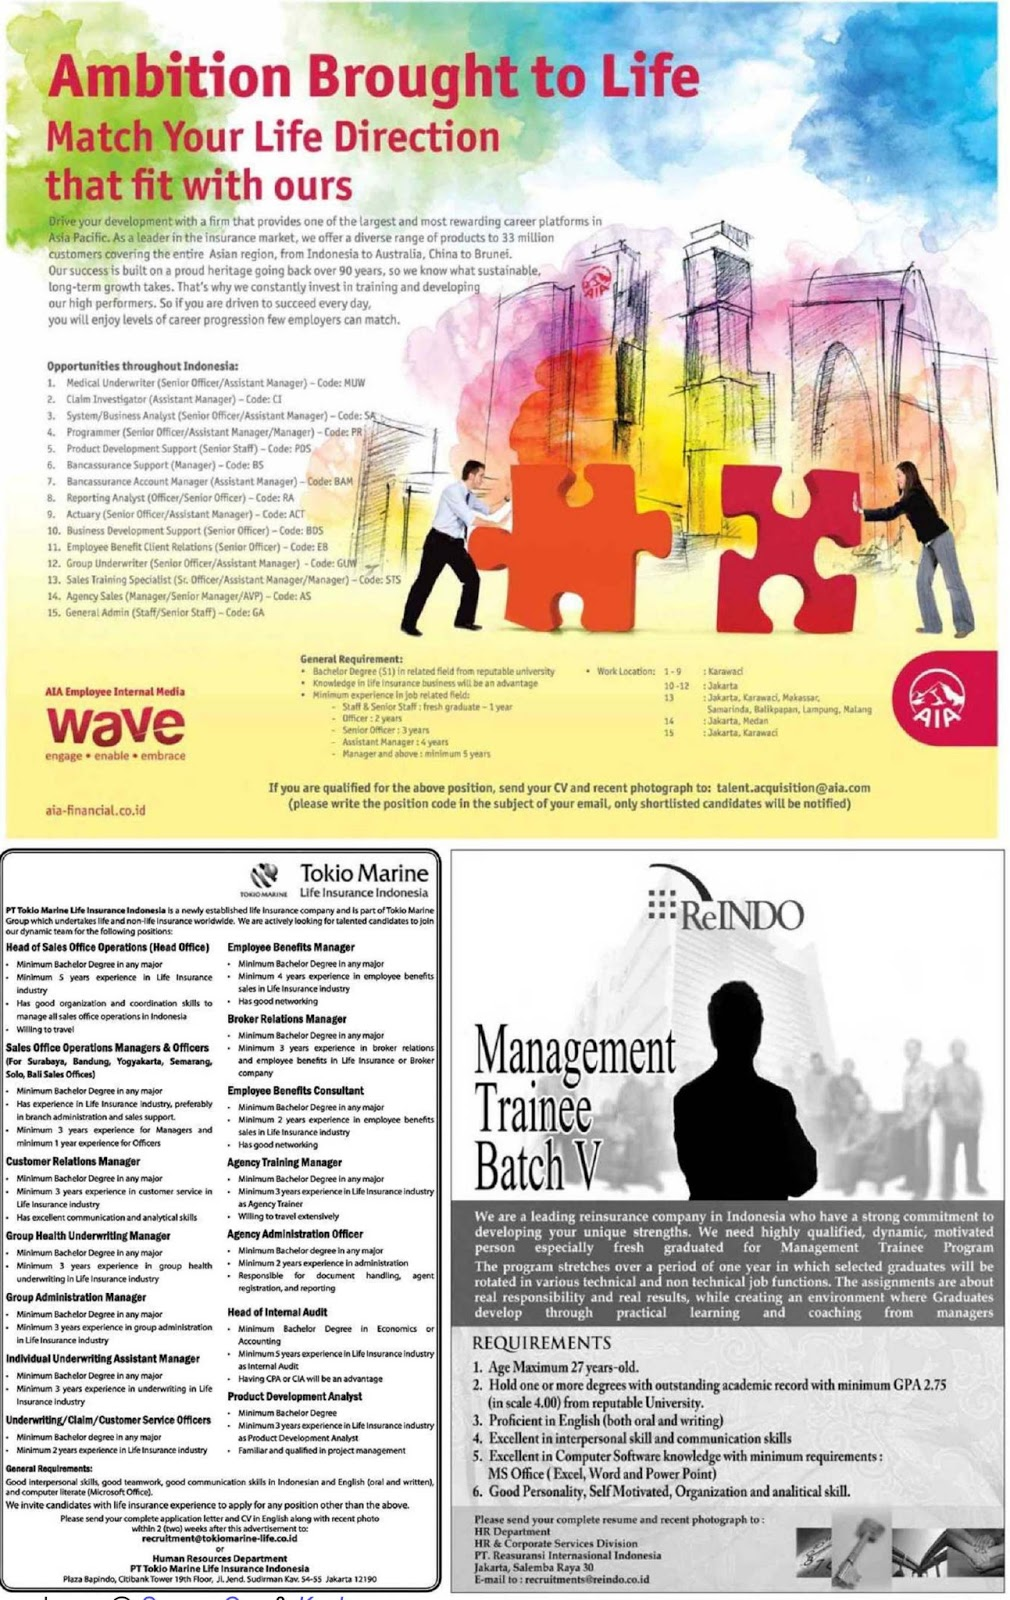 Lowongan Kerja Koran Kompas 8 Situs Lowongan Kerja Terpercaya Di Indonesia Lowongan Kerja Koran Kompas Sabtu 16 Maret 2013 Lowongan Kompas